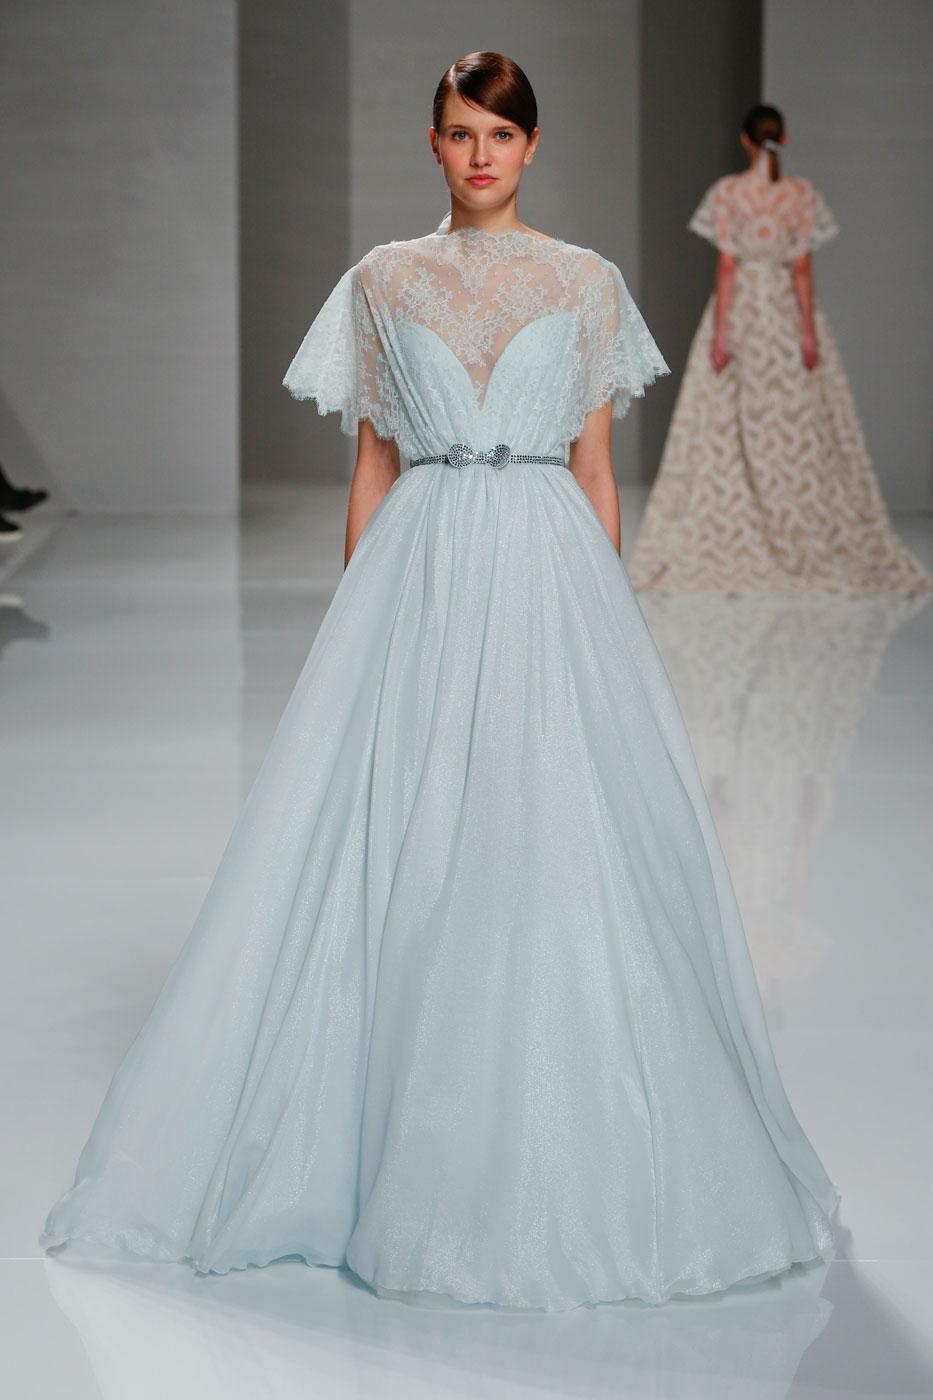 Georges-Hobeika-fashion-runway-show-haute-couture-paris-spring-2015-the-impression-61